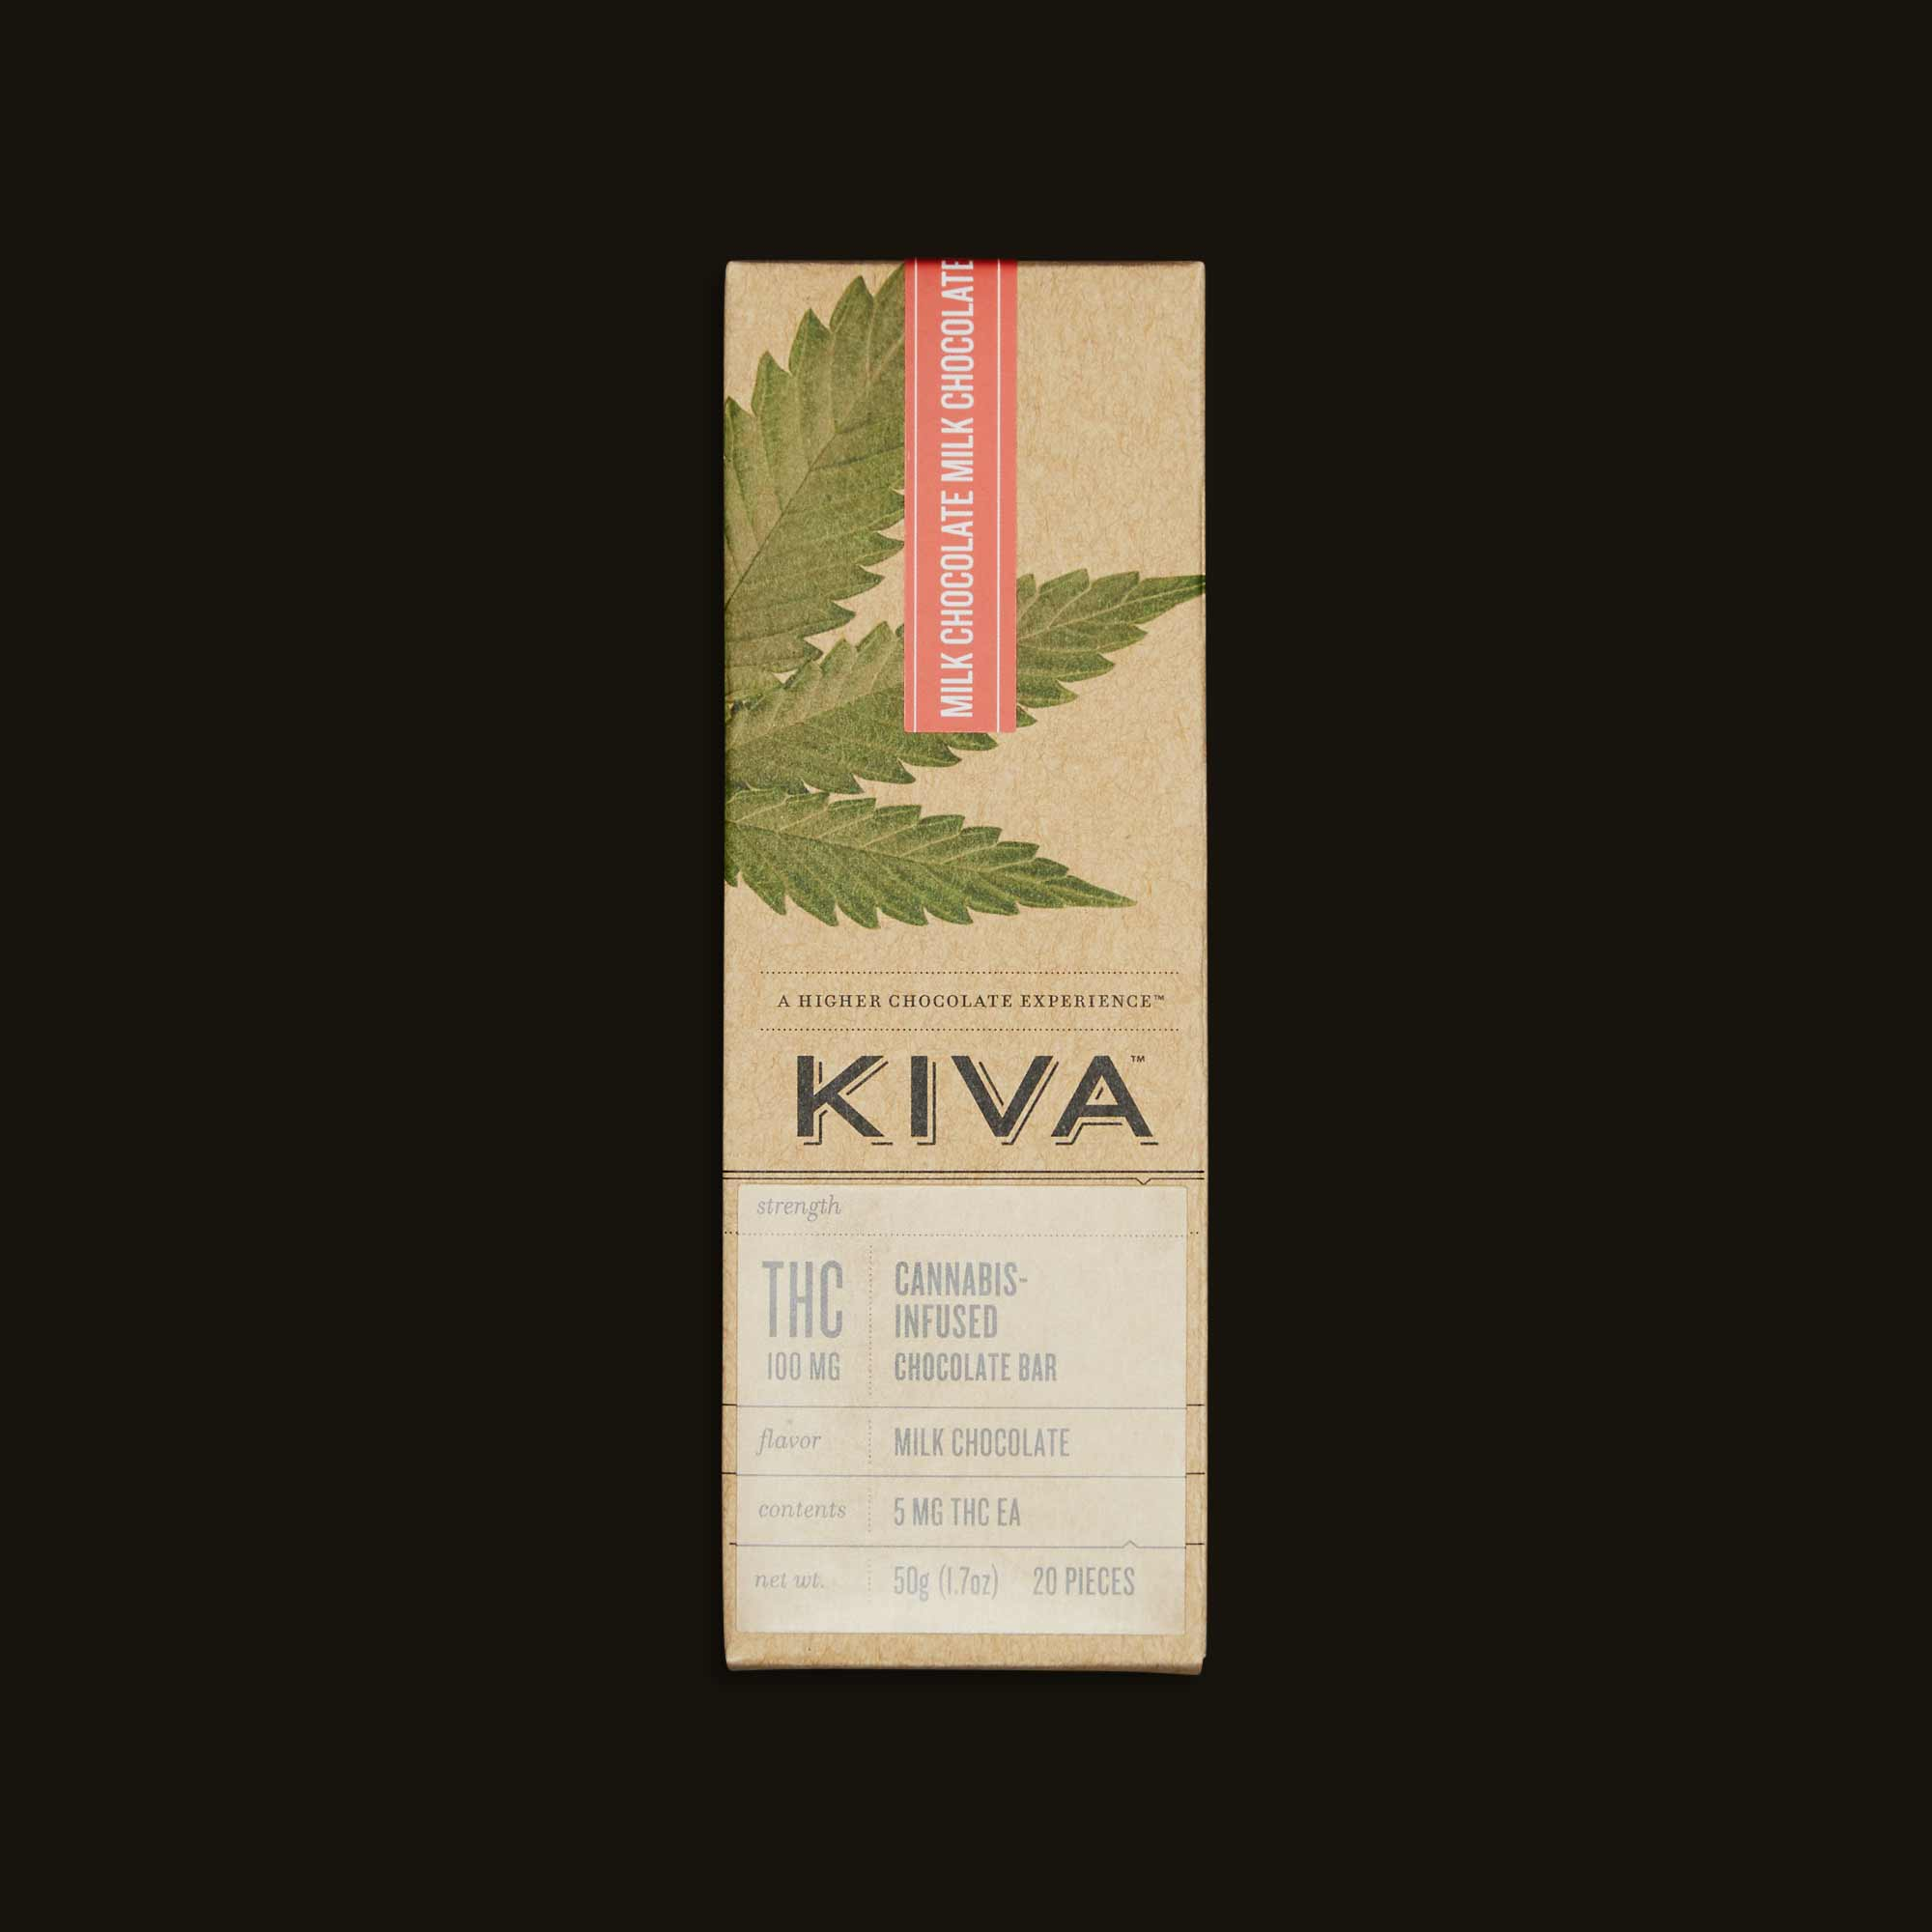 Package of Kiva Milk Chocolate Cannabis Infused bar